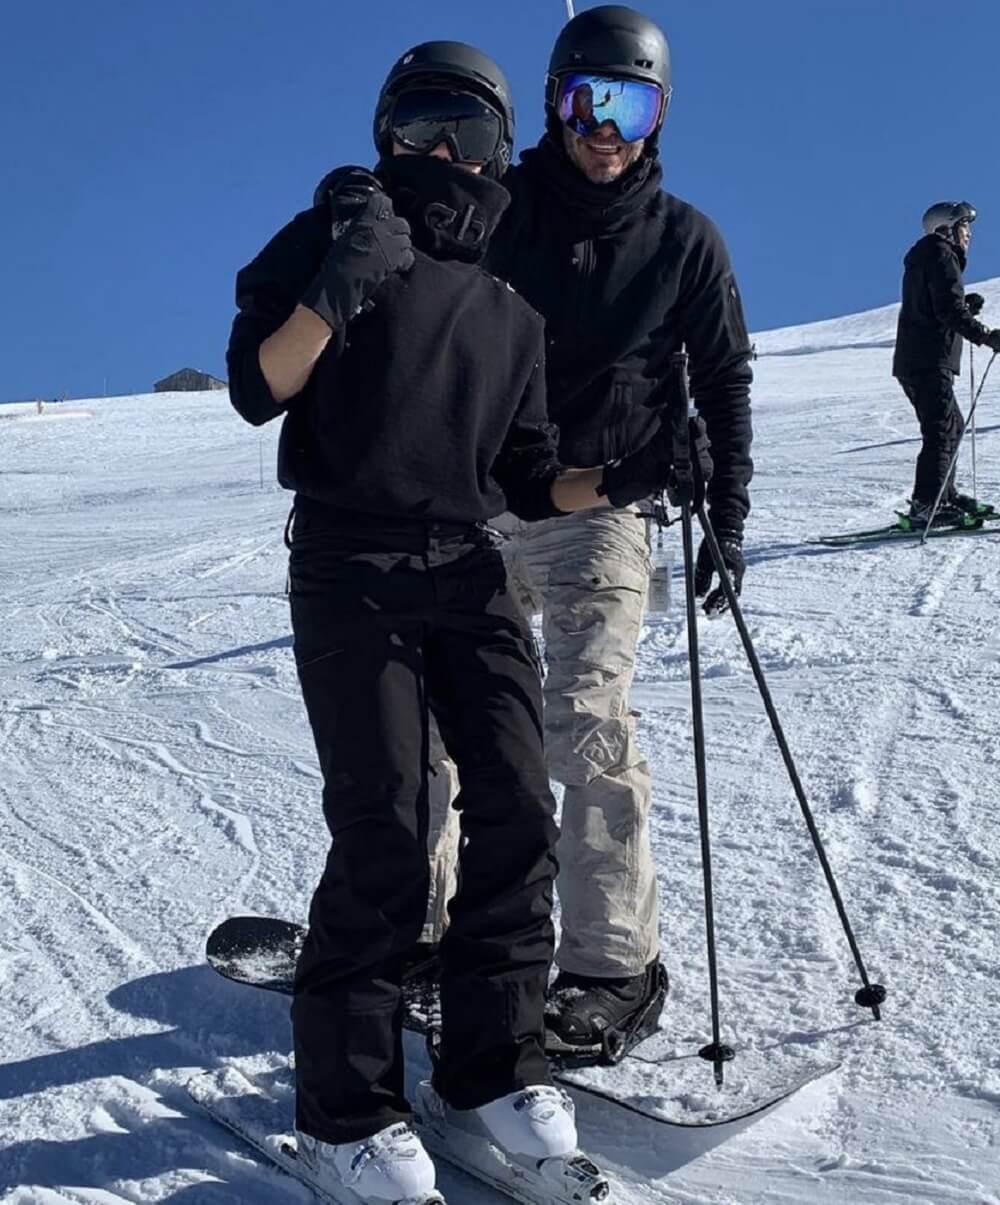 Victoria ve Daivid Beckham Sanit Gervais'te kayak yaptı.